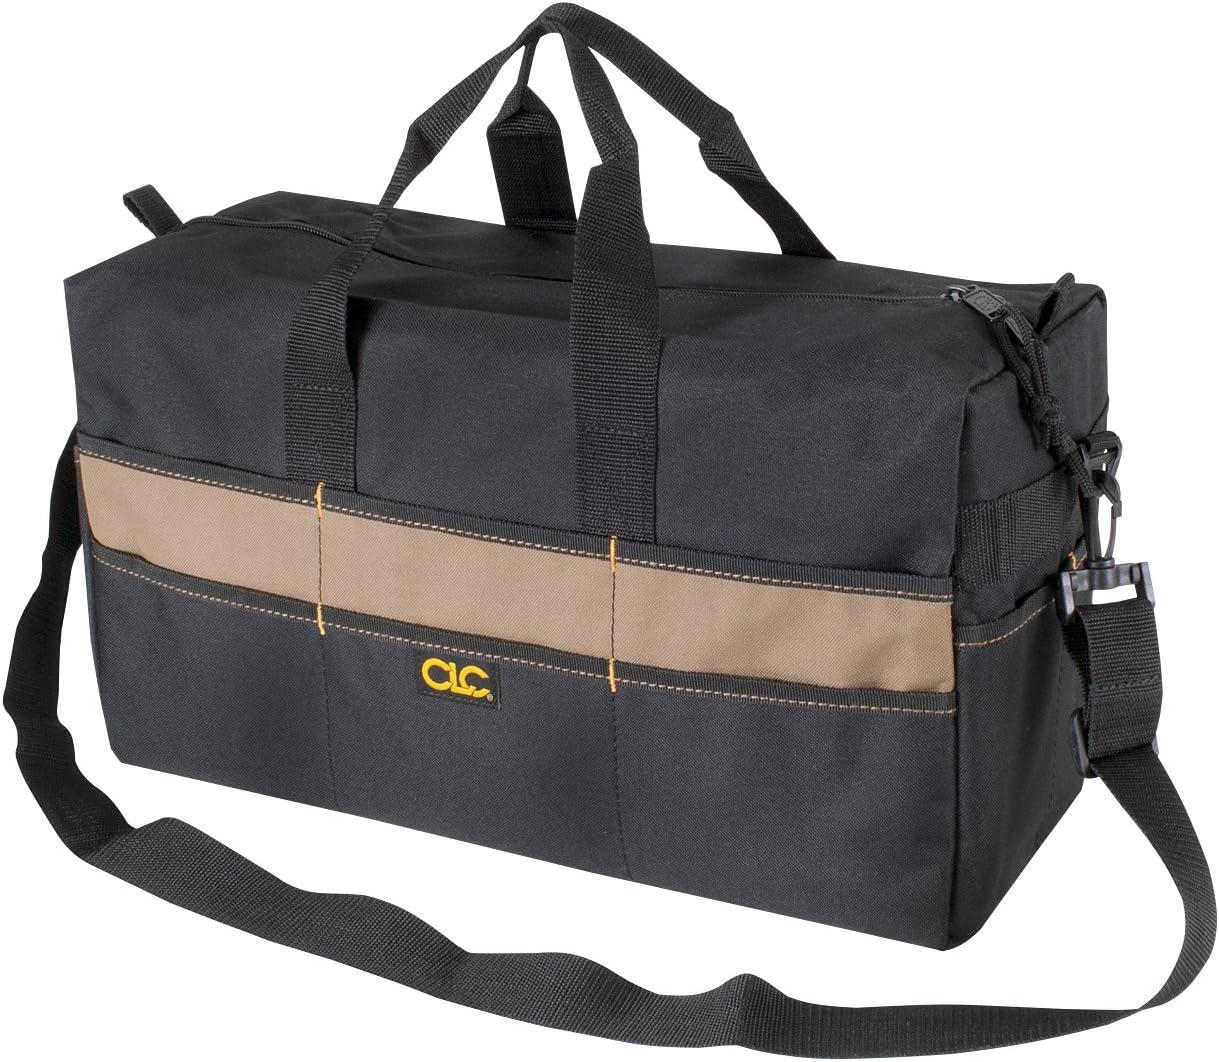 CLC Custom Leathercraft 1113 XL Tote Bag, 17-Pocket